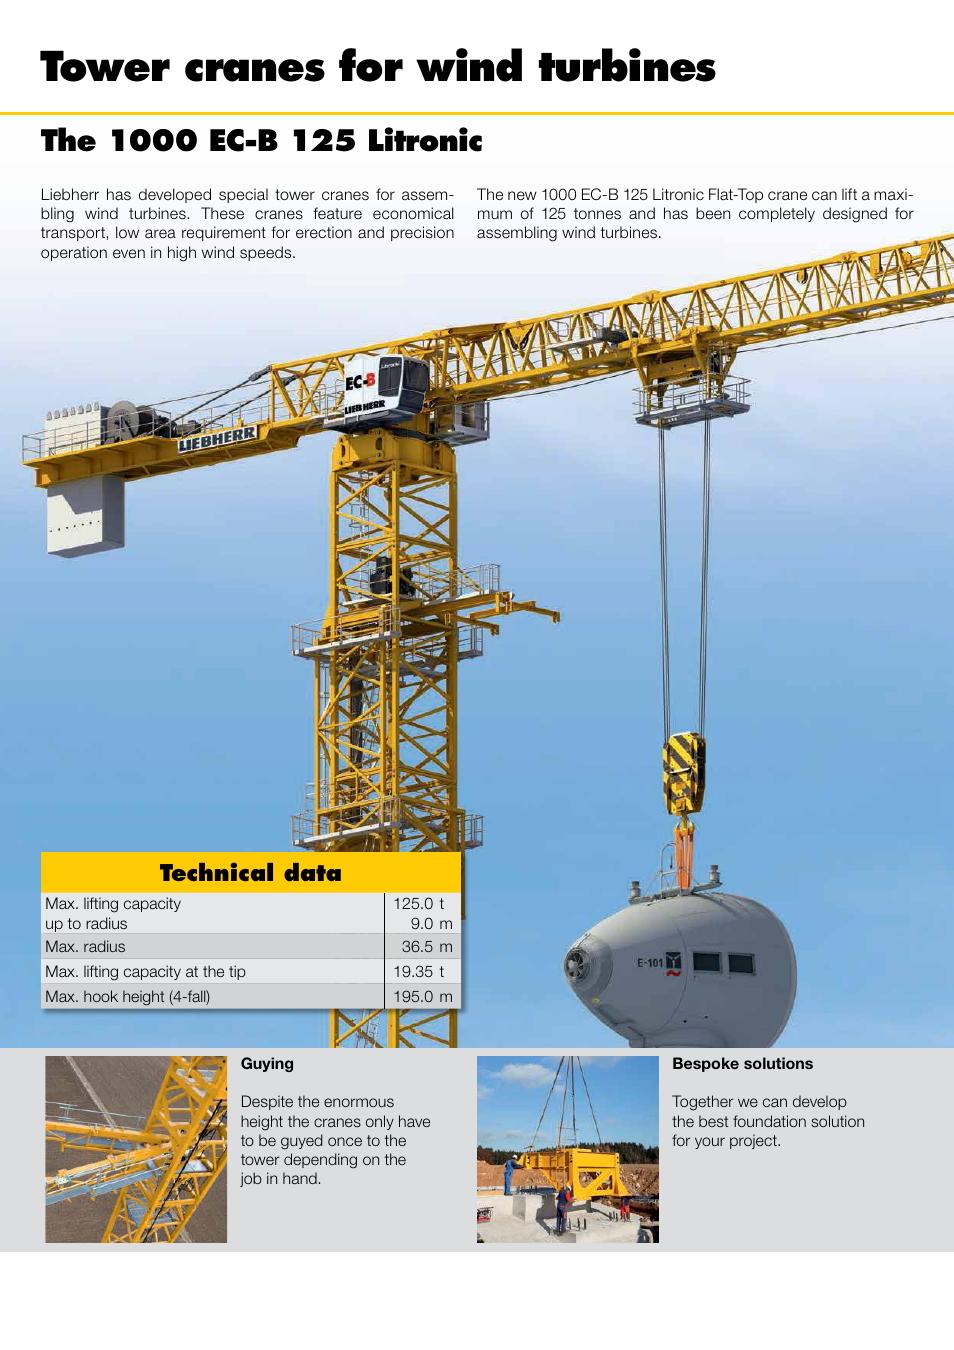 tower cranes for wind turbines technical data liebherr 1000 ec b rh manualsdir com Liebherr Tower Cranes Specifications Liebherr Self-Erecting Tower Crane